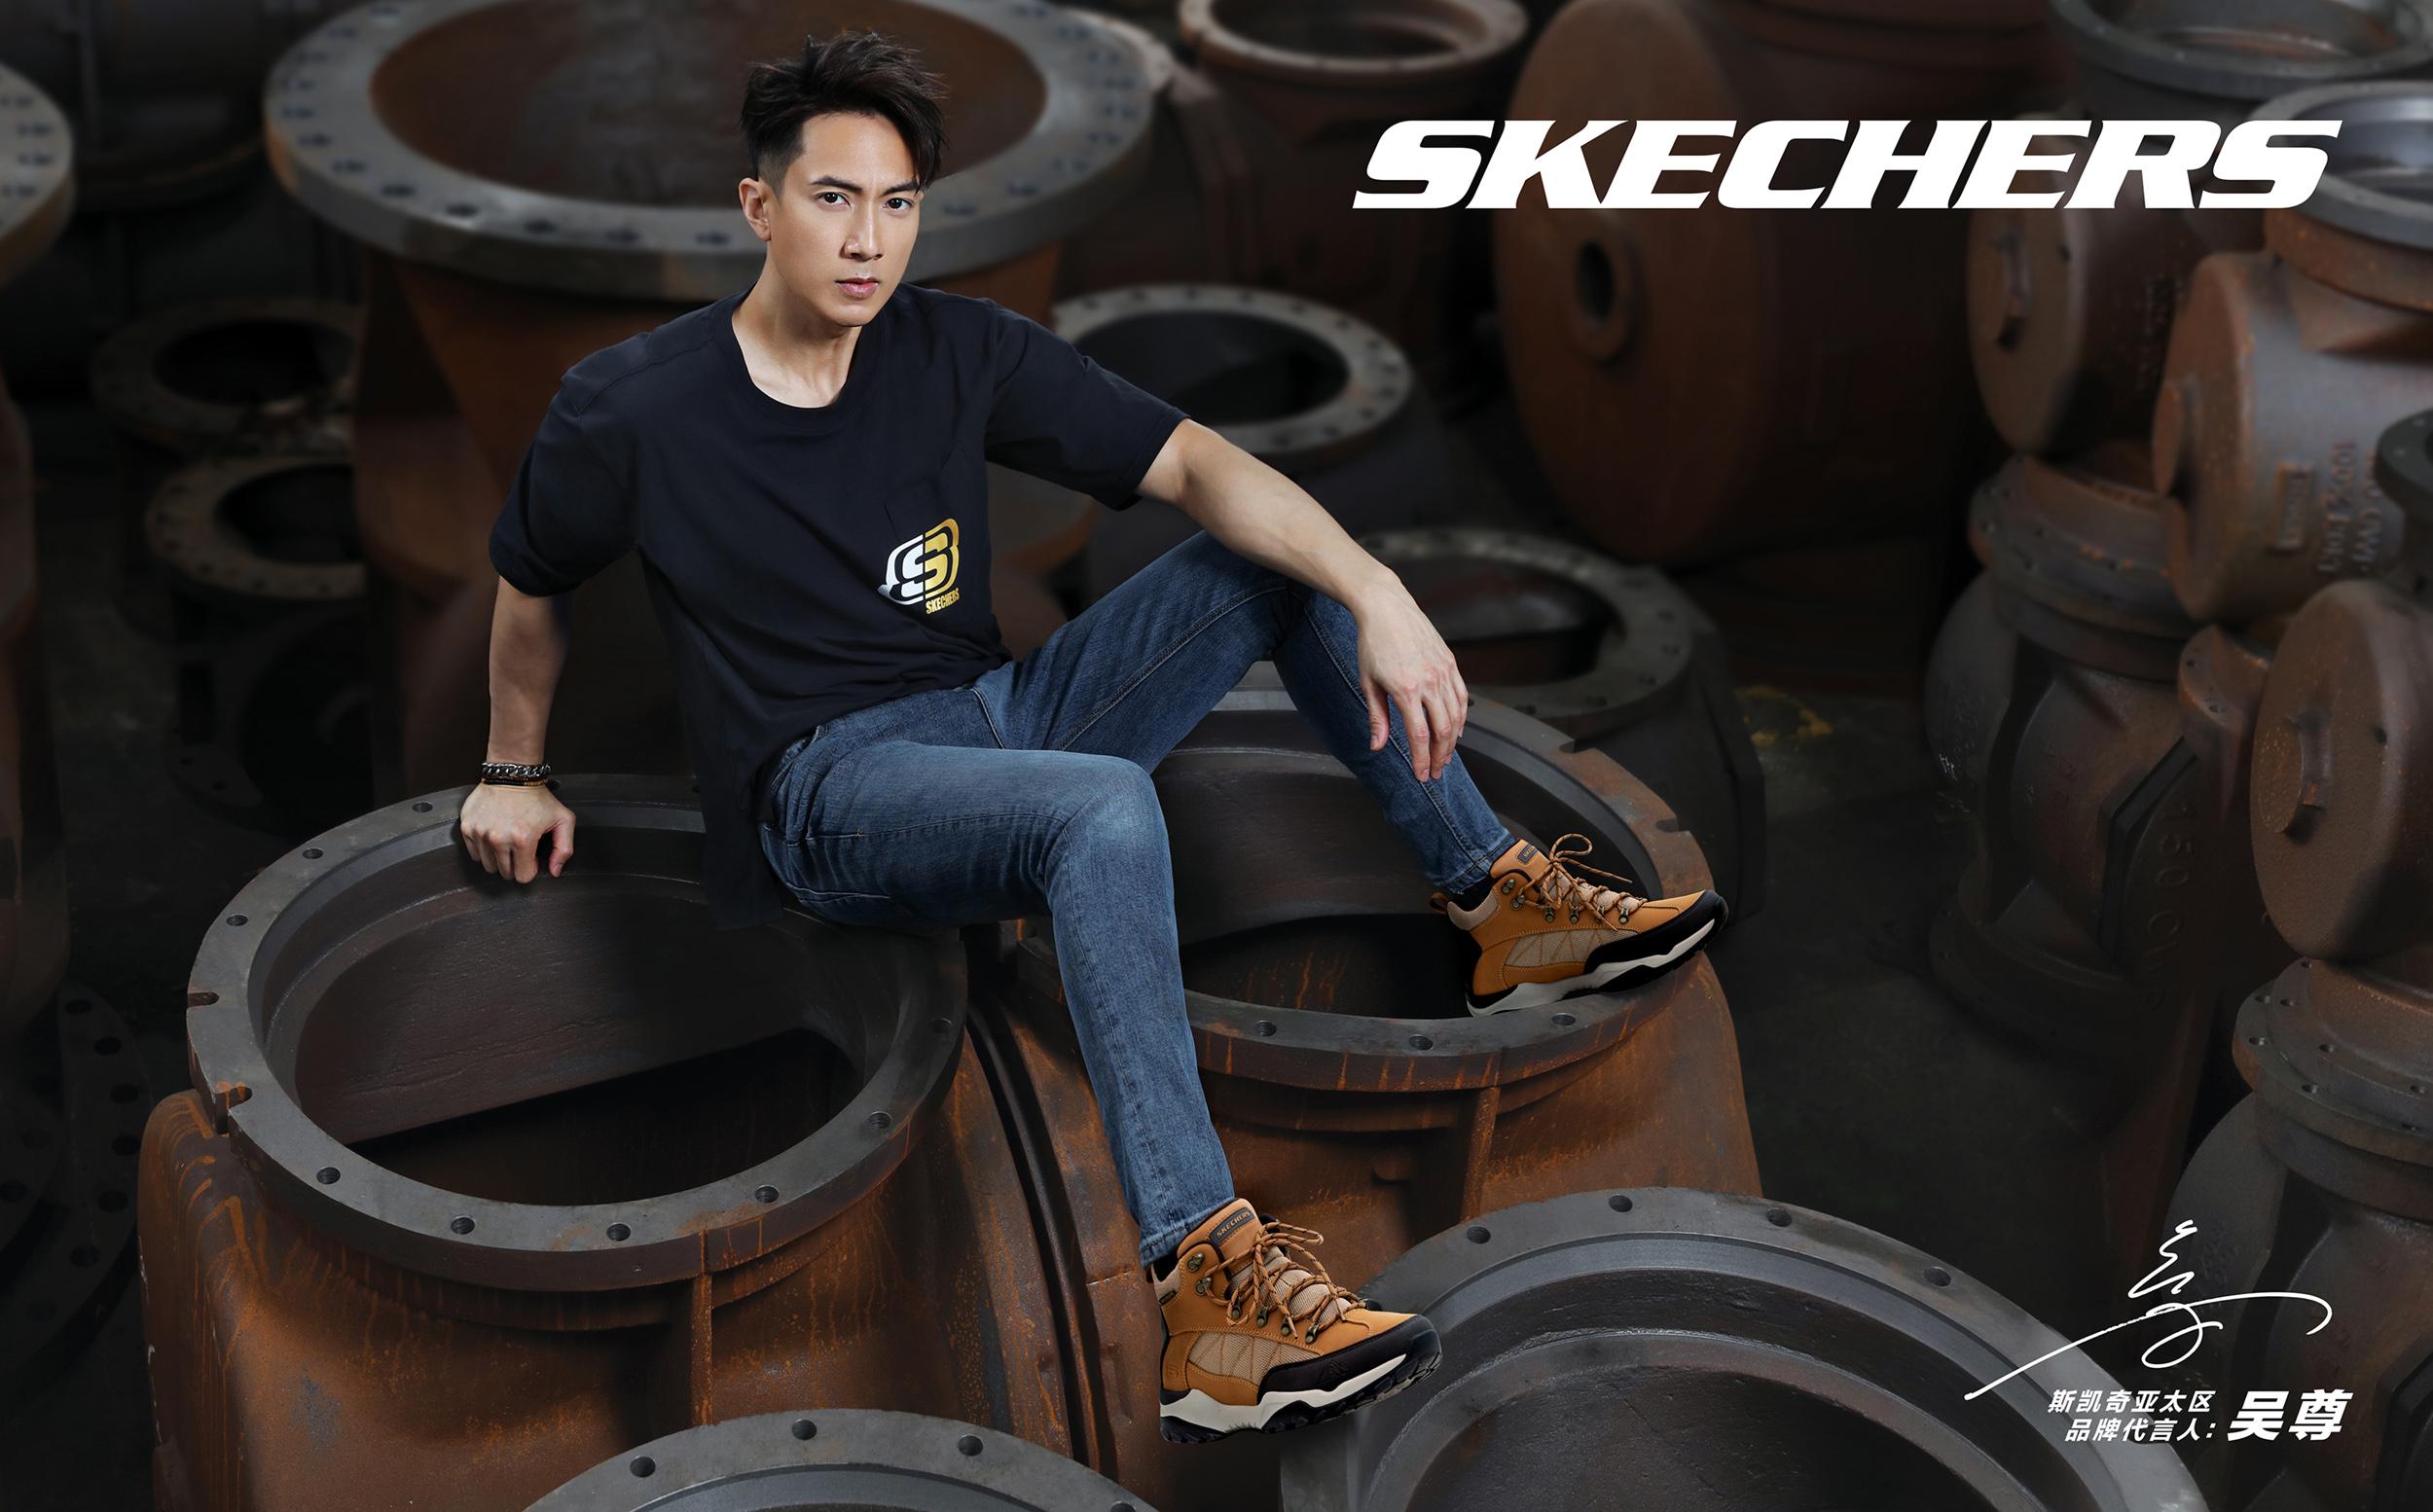 Skechers_2019Q3Q4_5_h